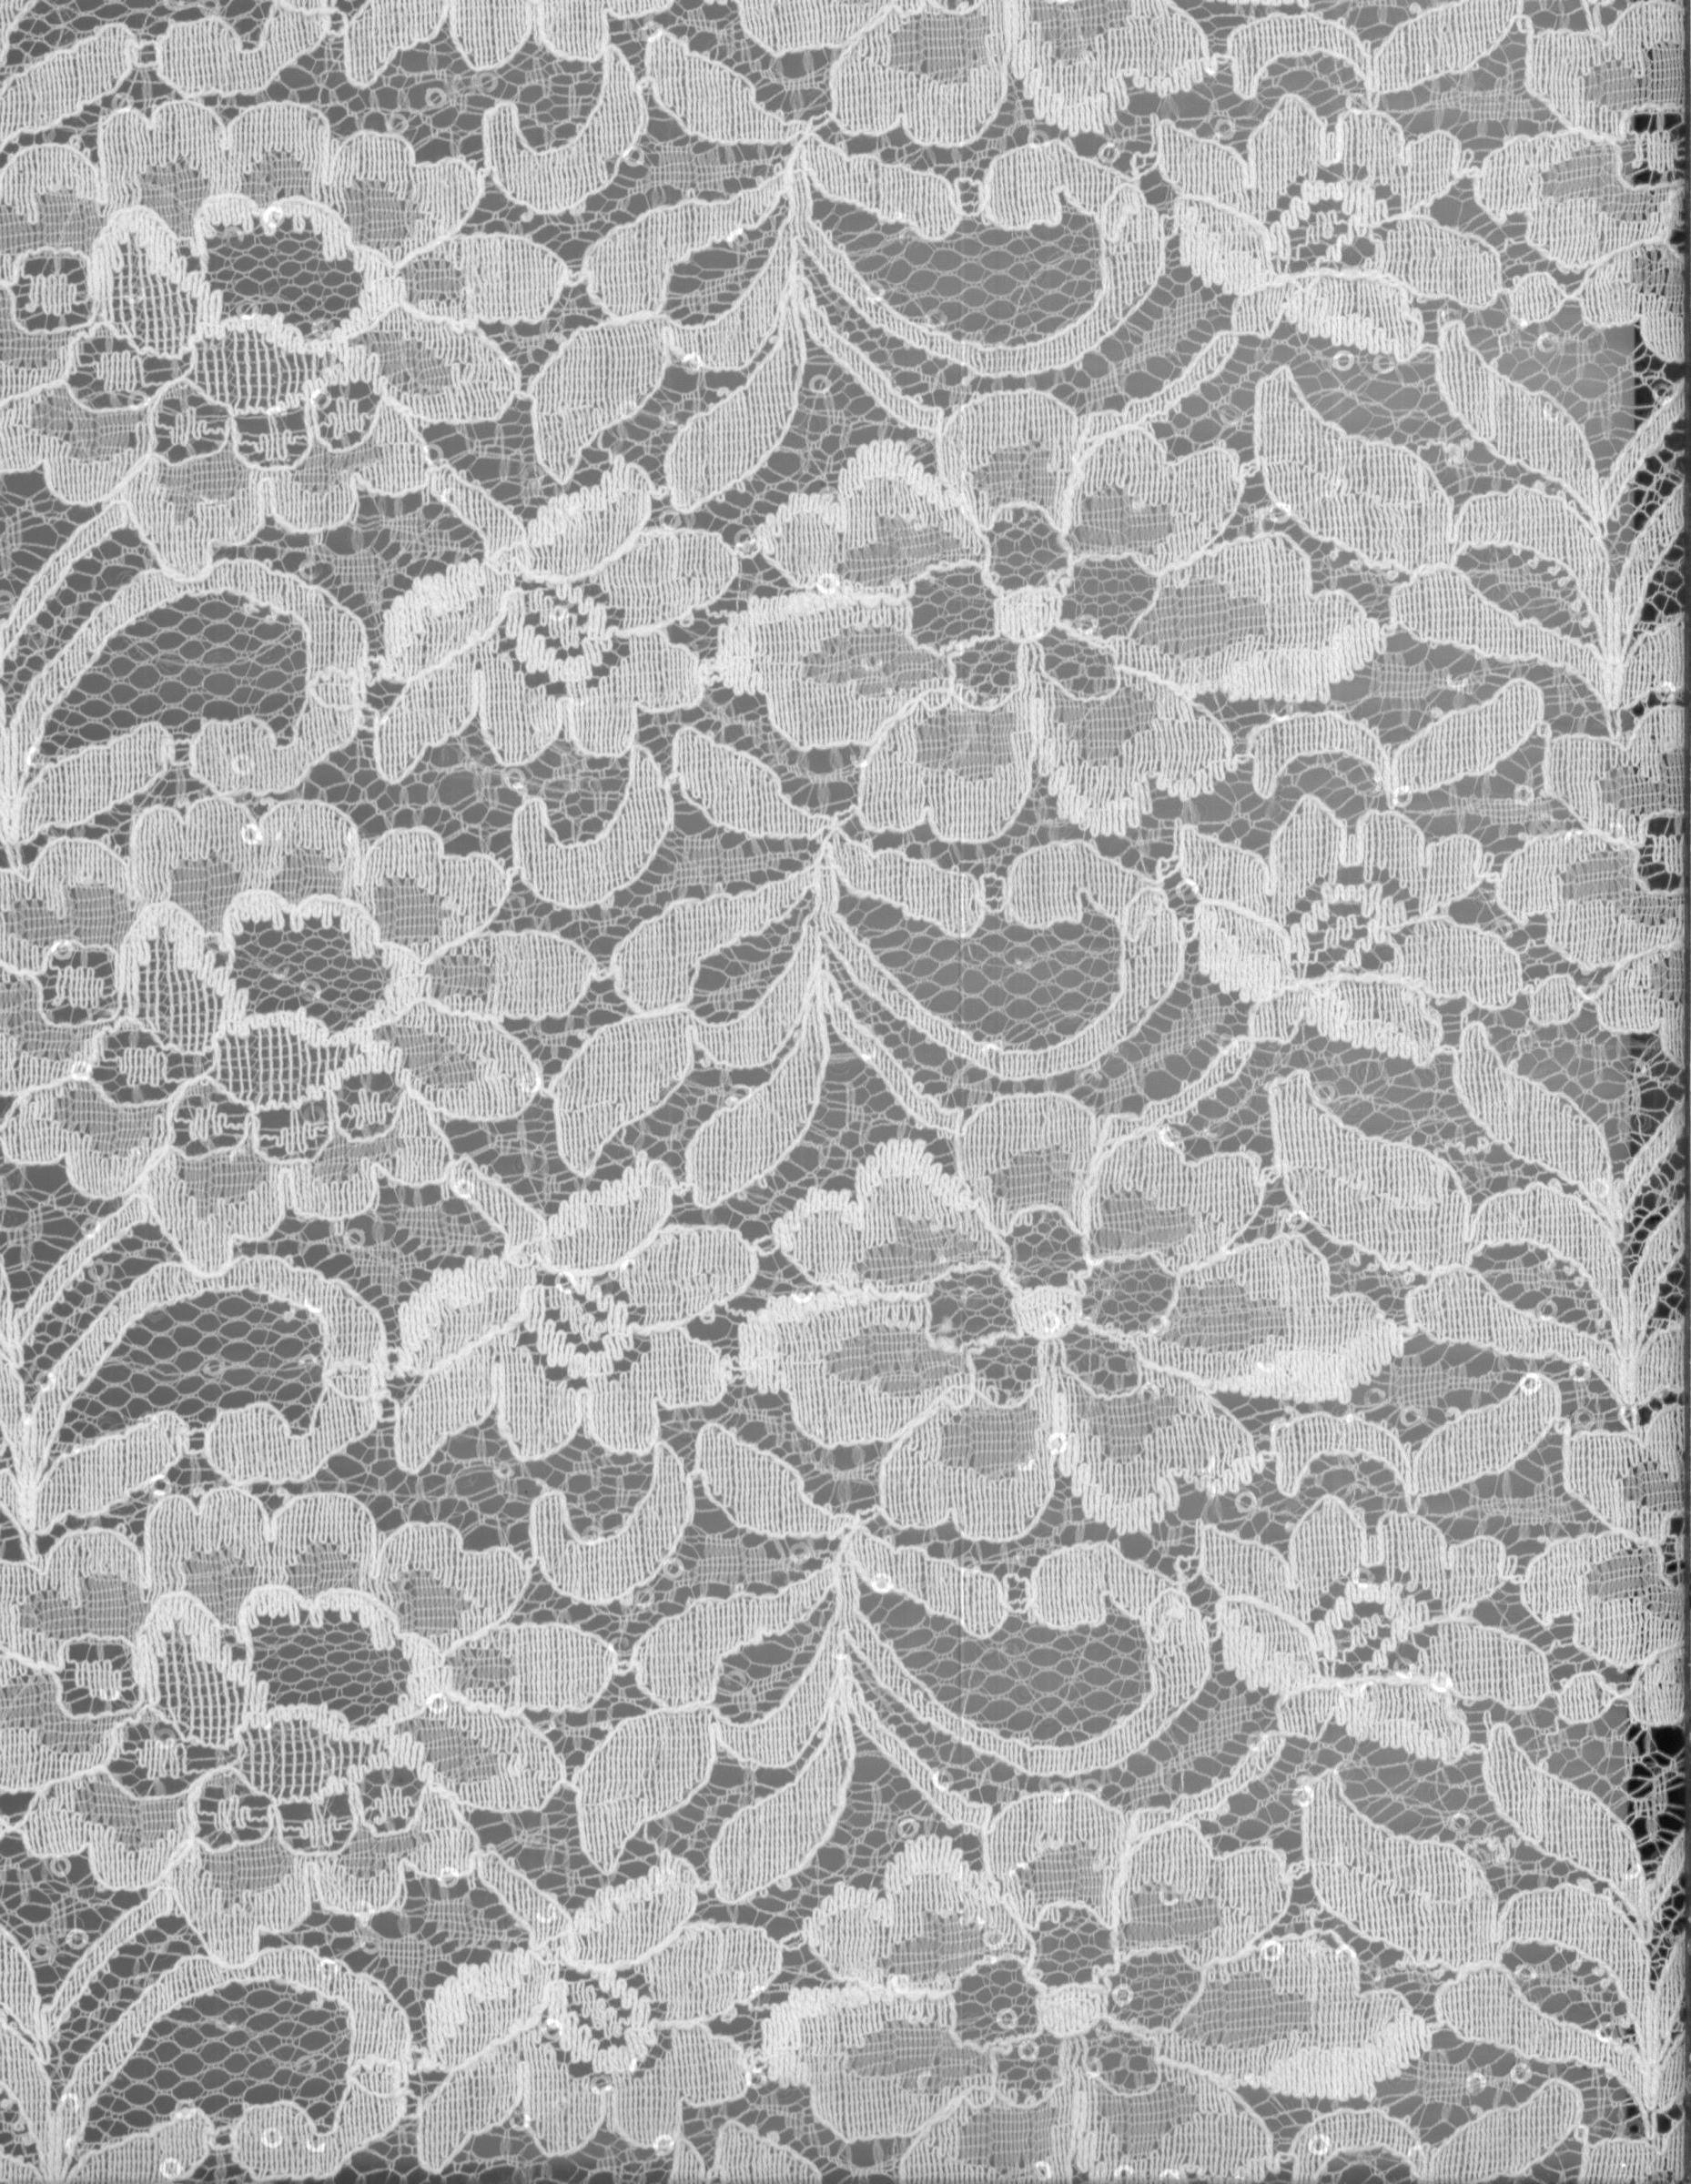 White apron joann fabrics - Bridal Inspirations Fabric Sequin Lace White